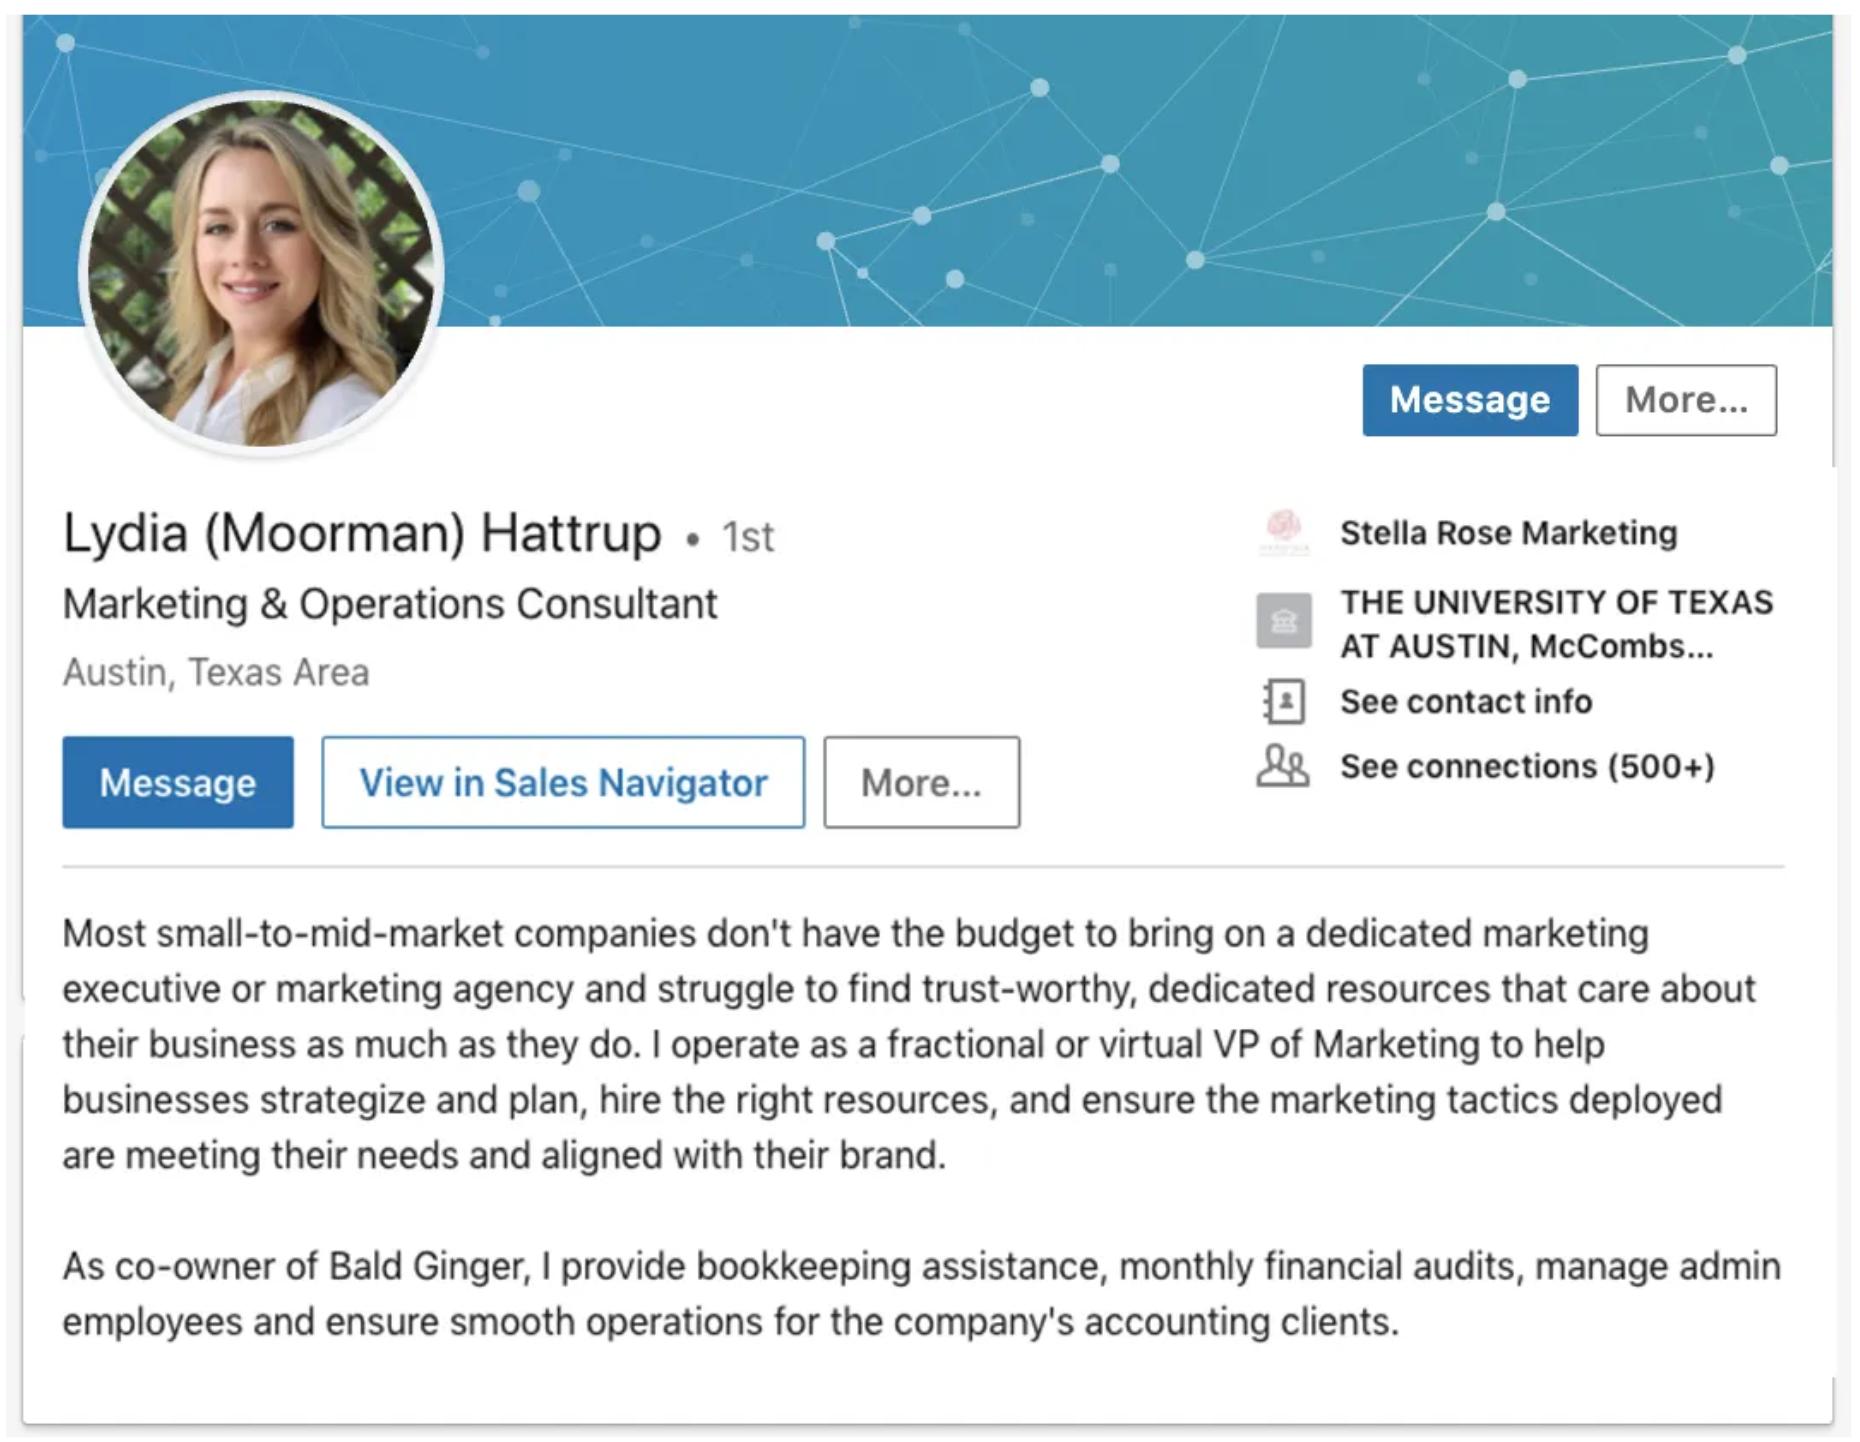 using LinkedIn for sales - prospect-focused summary